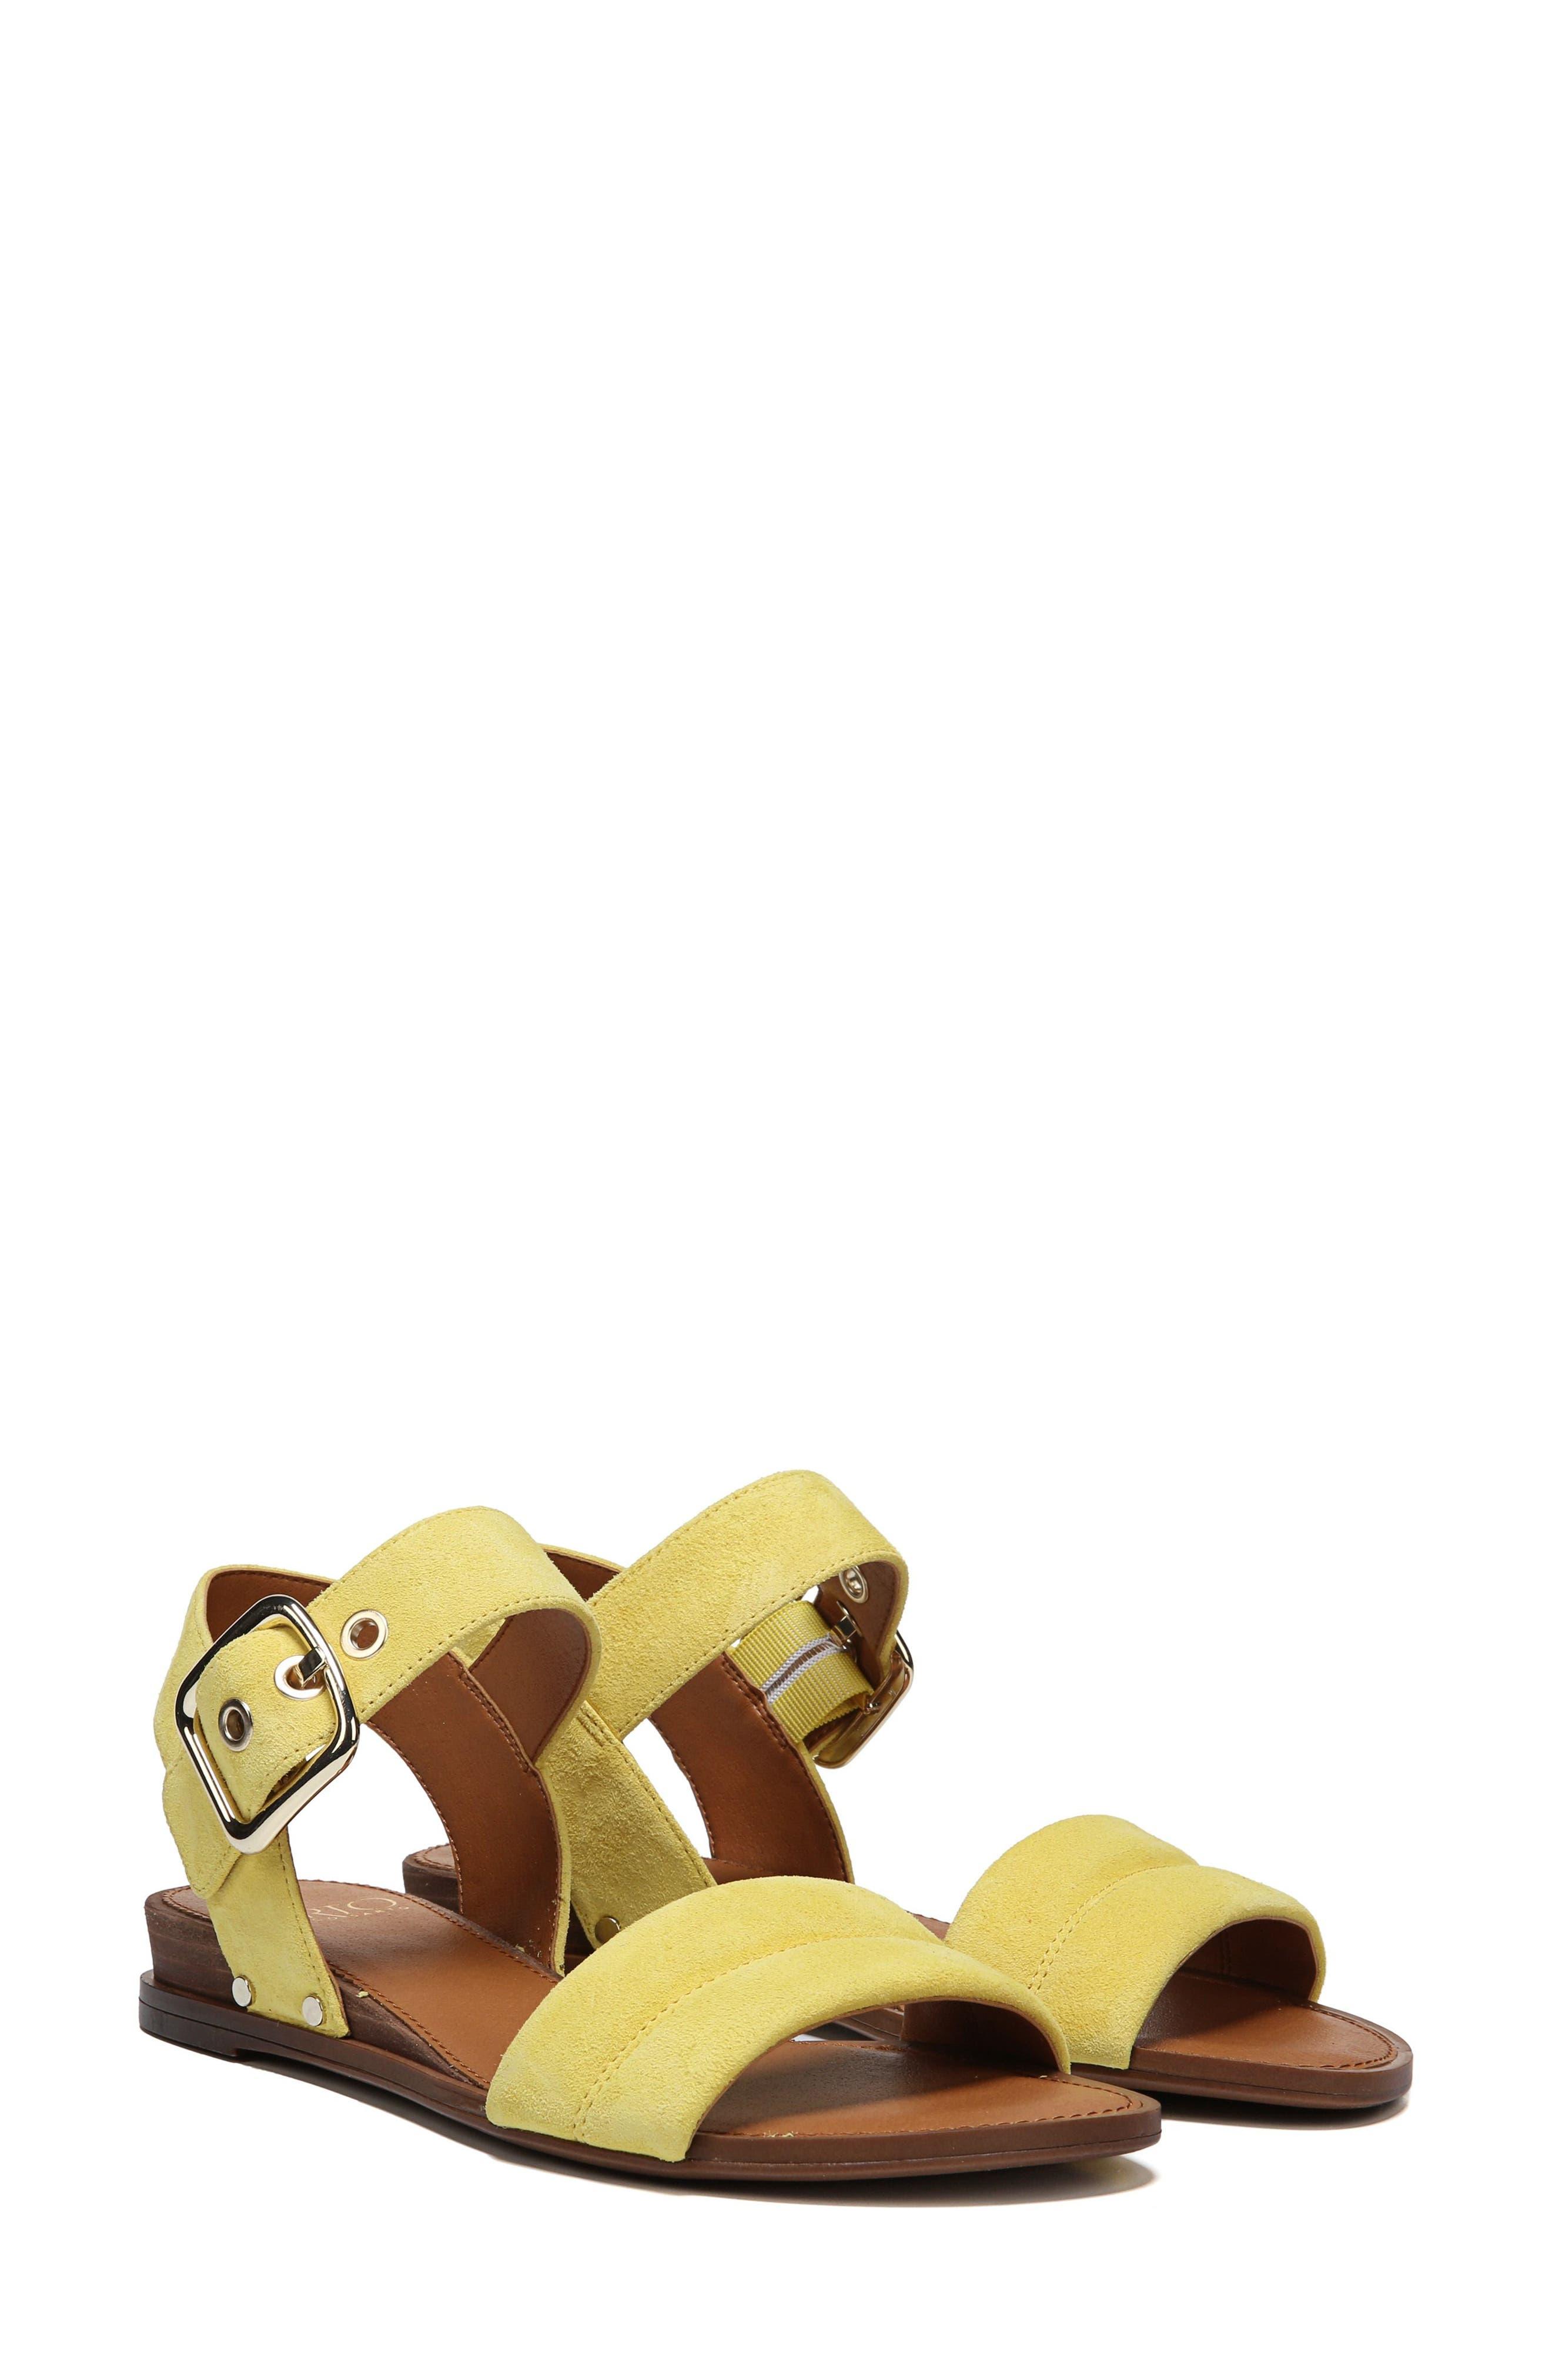 Patterson Low Wedge Sandal,                             Alternate thumbnail 54, color,